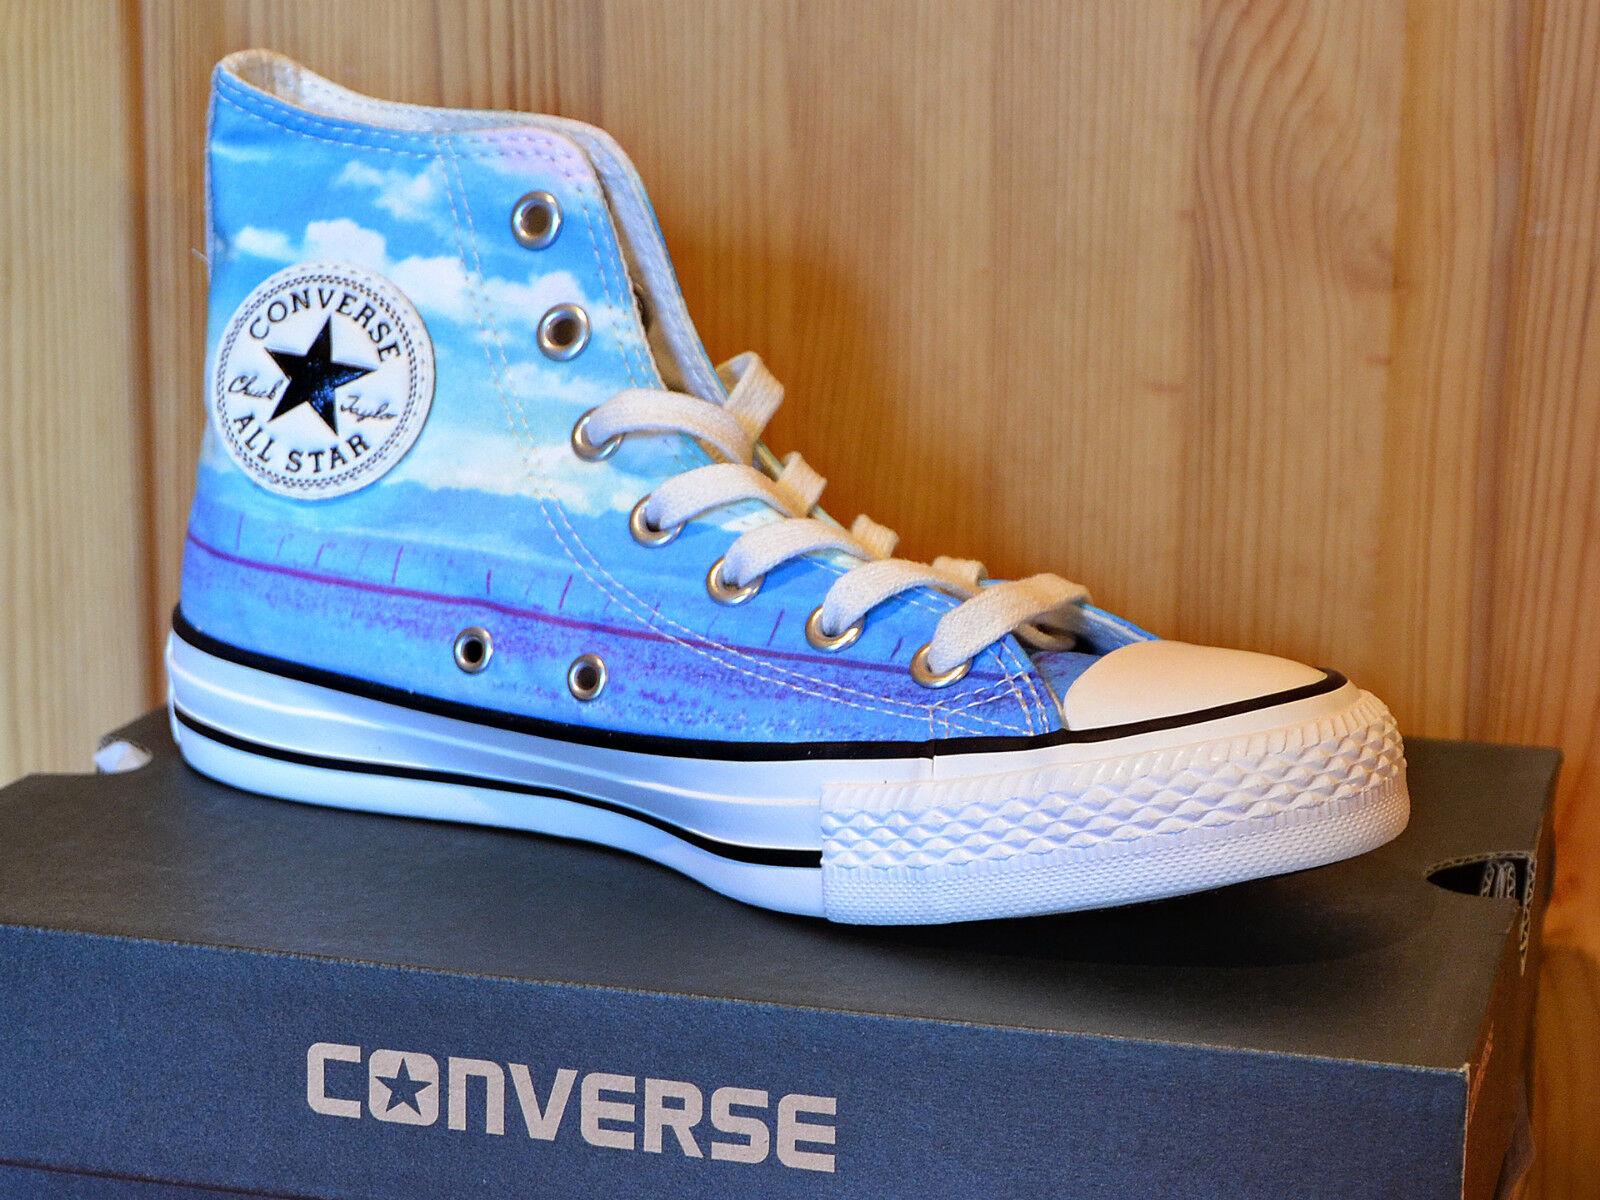 Converse Chucks Taylor EU All Star Hi Sneaker EU Taylor 37 Photo Real Sunset 551007C 158d77